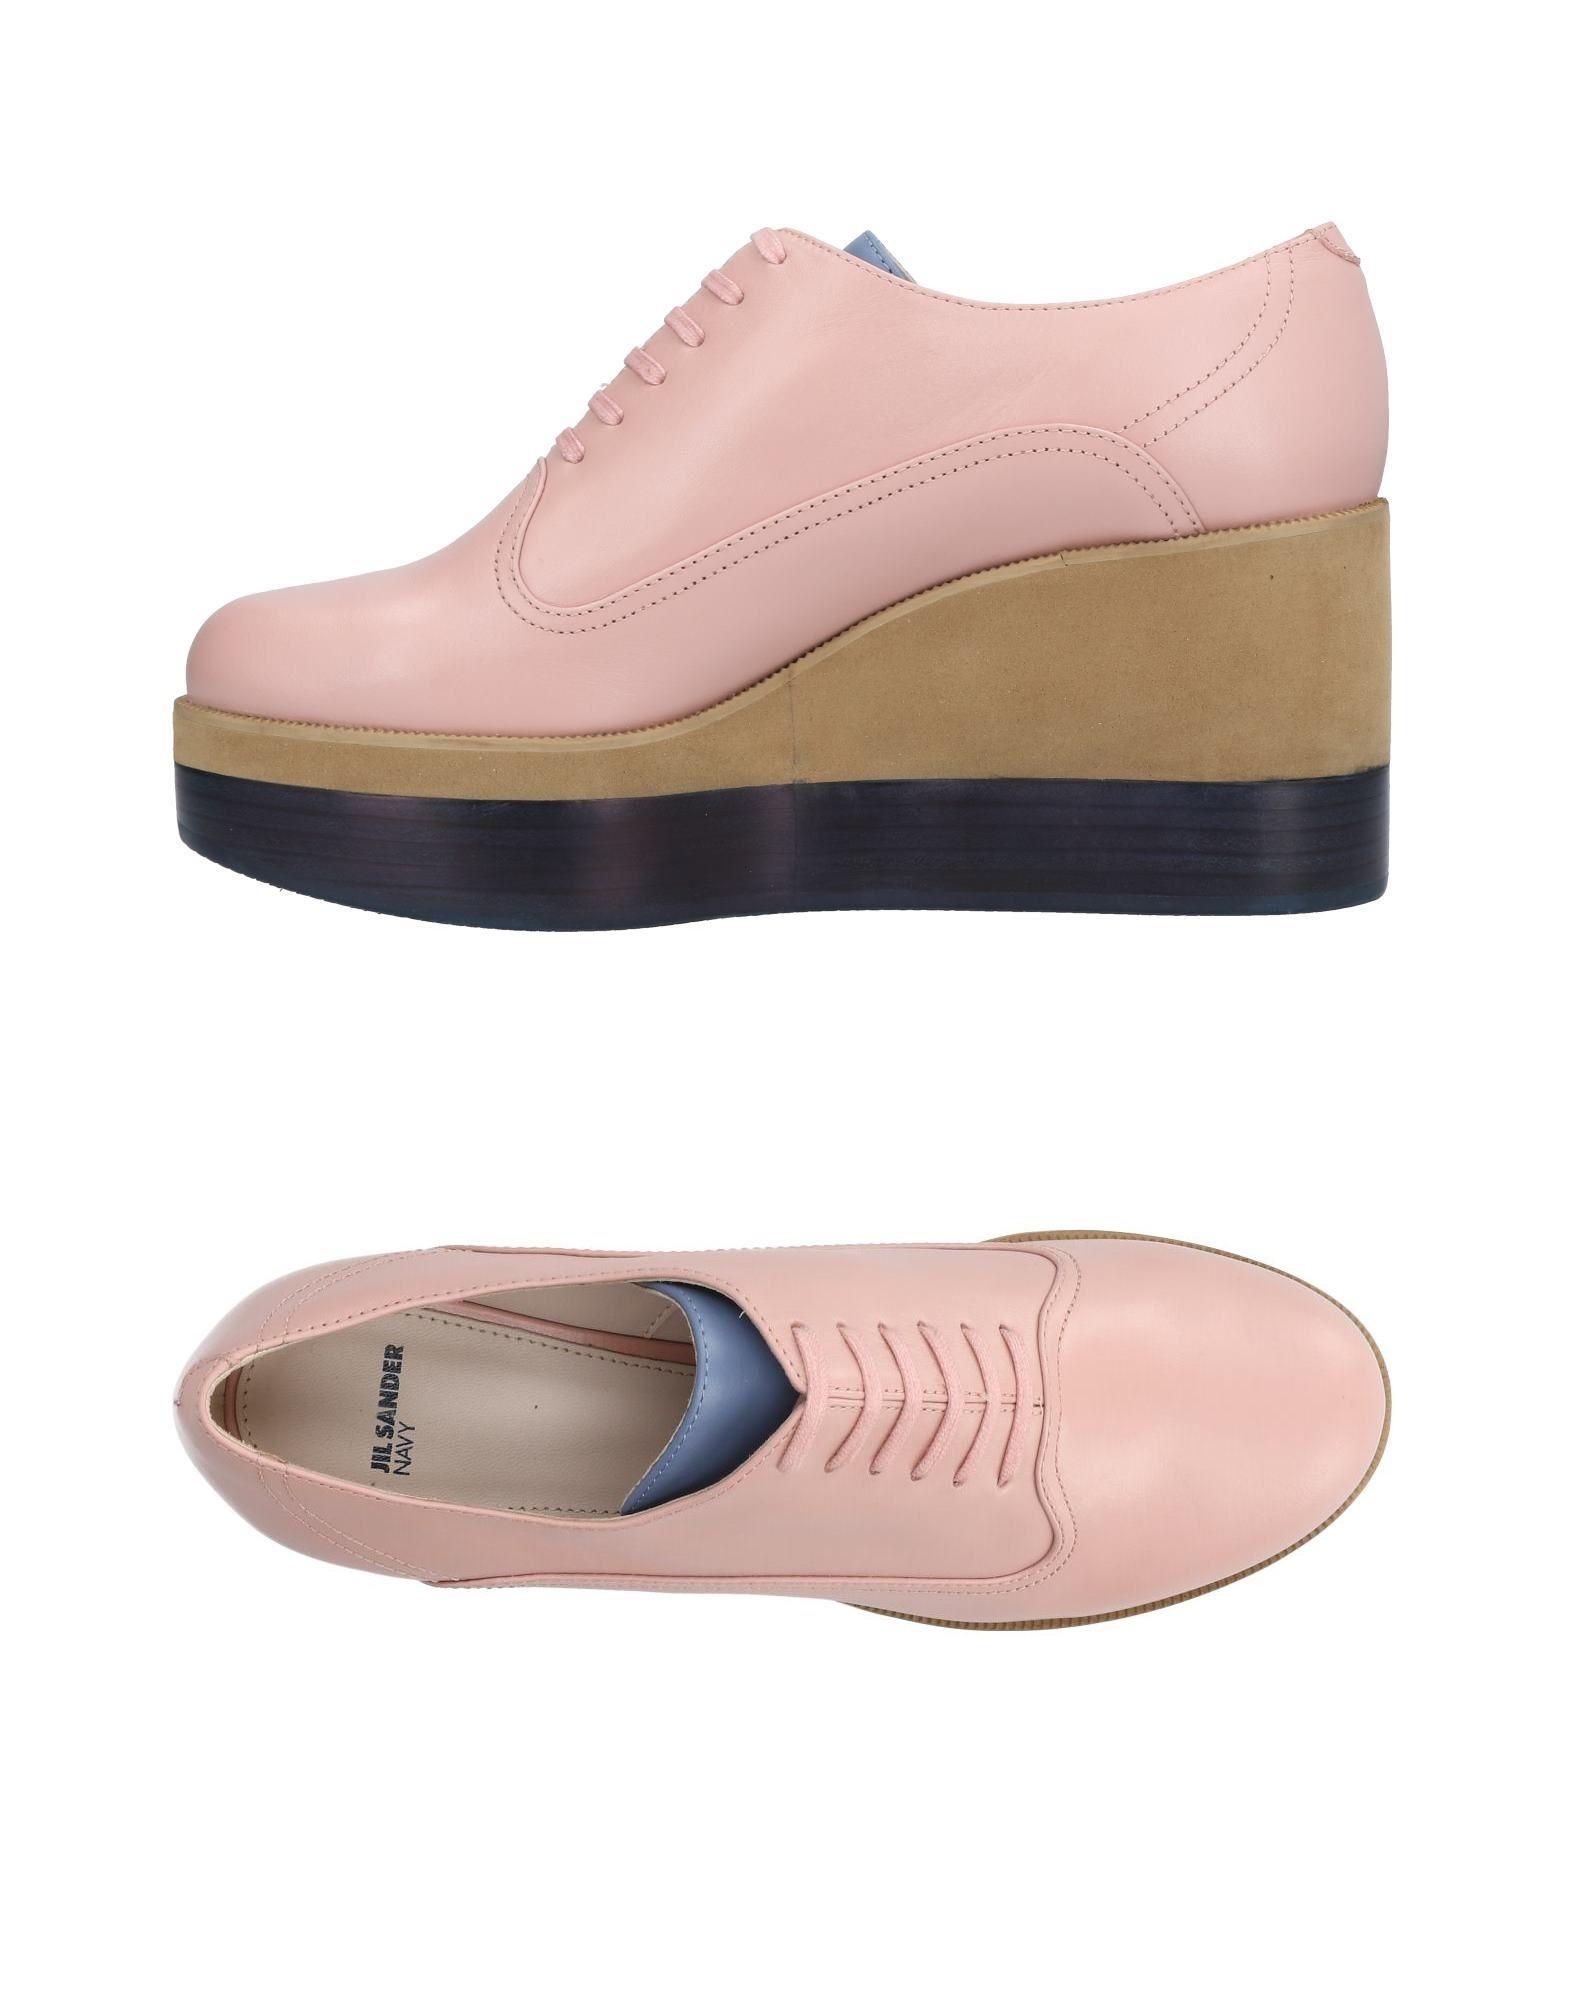 Jil Sander Navy Schnürschuhe Neue Damen  11433428NQ Neue Schnürschuhe Schuhe 96a123